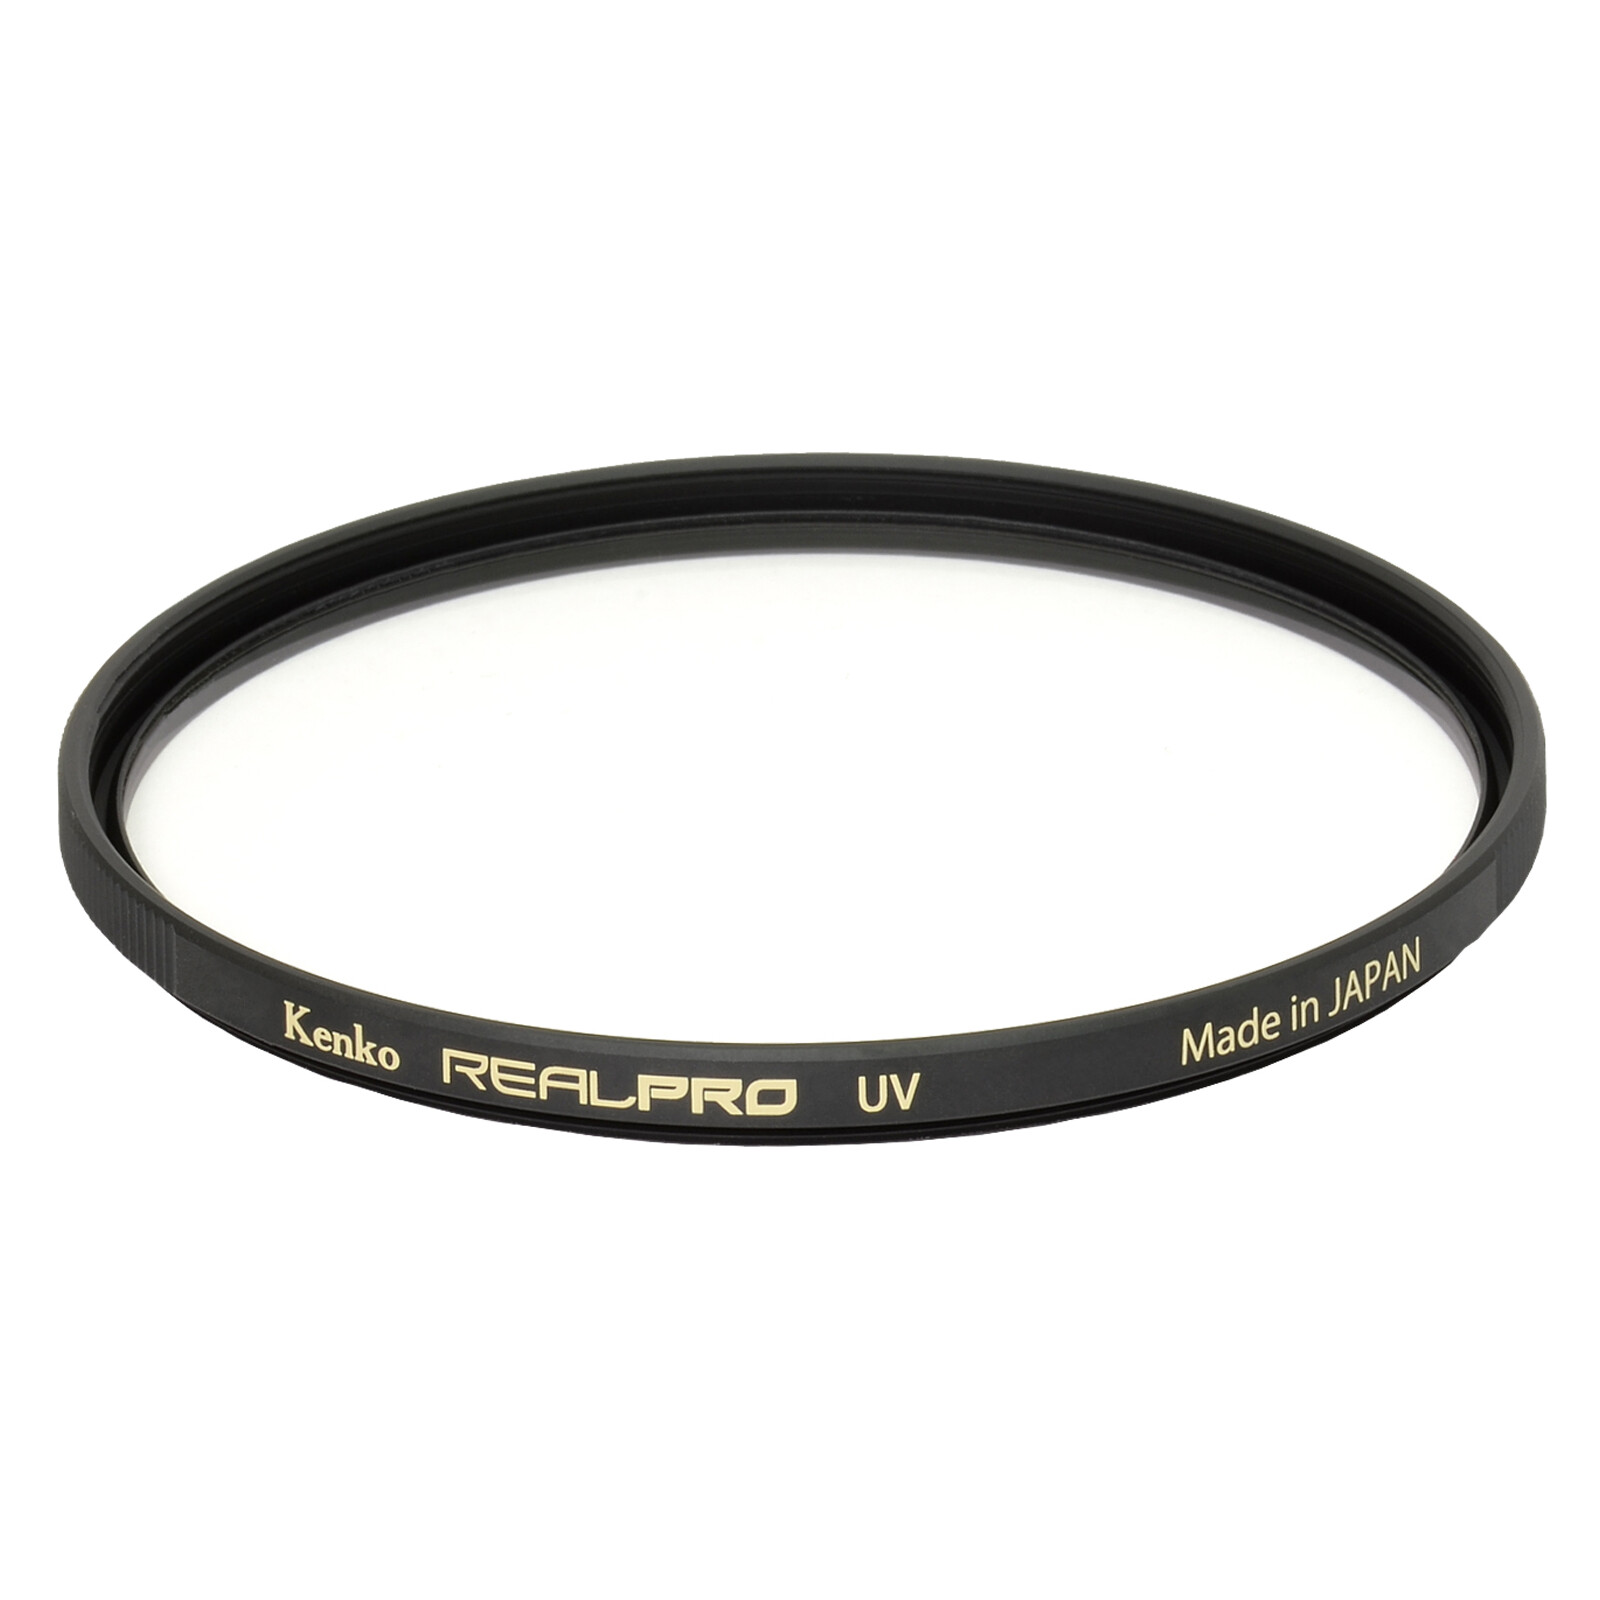 Kenko Real Pro UV 67mm Slim